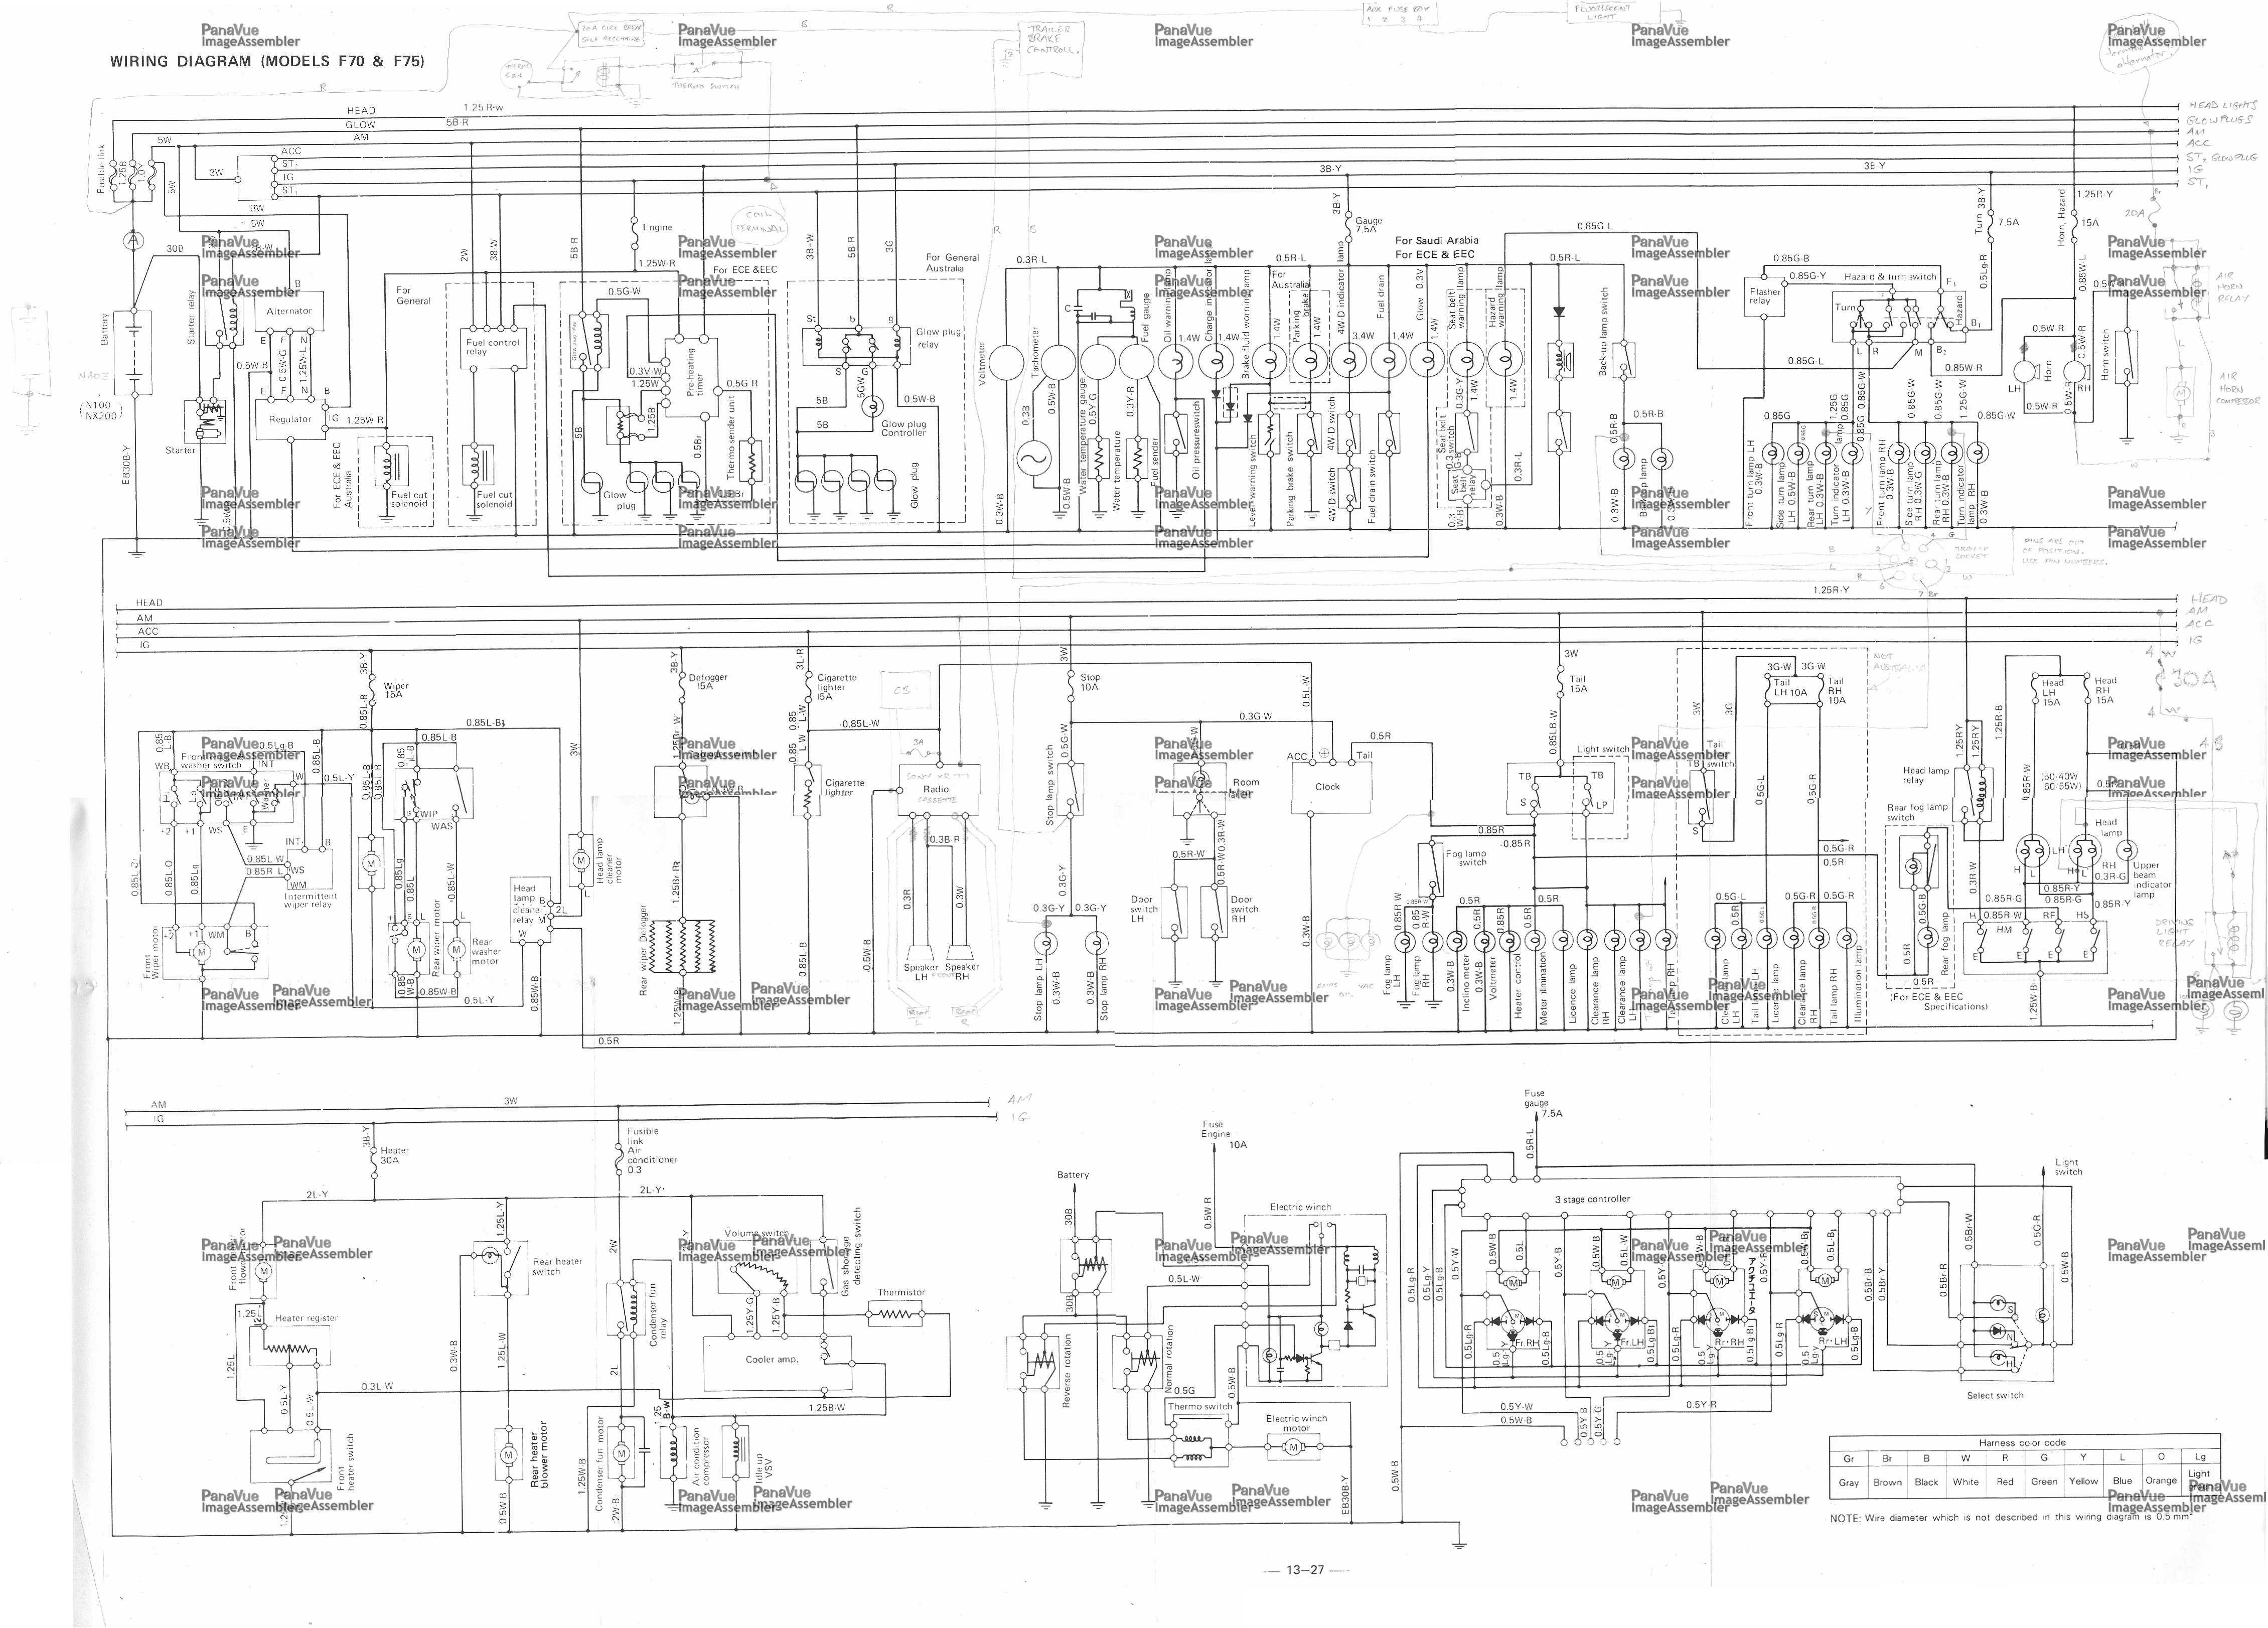 Yamaha Venture Motorcycle Engine Diagrams Wiring Data Base Diagram And Schematics Rh Rivcas Org On 1999 Blaster For G11 Schematic